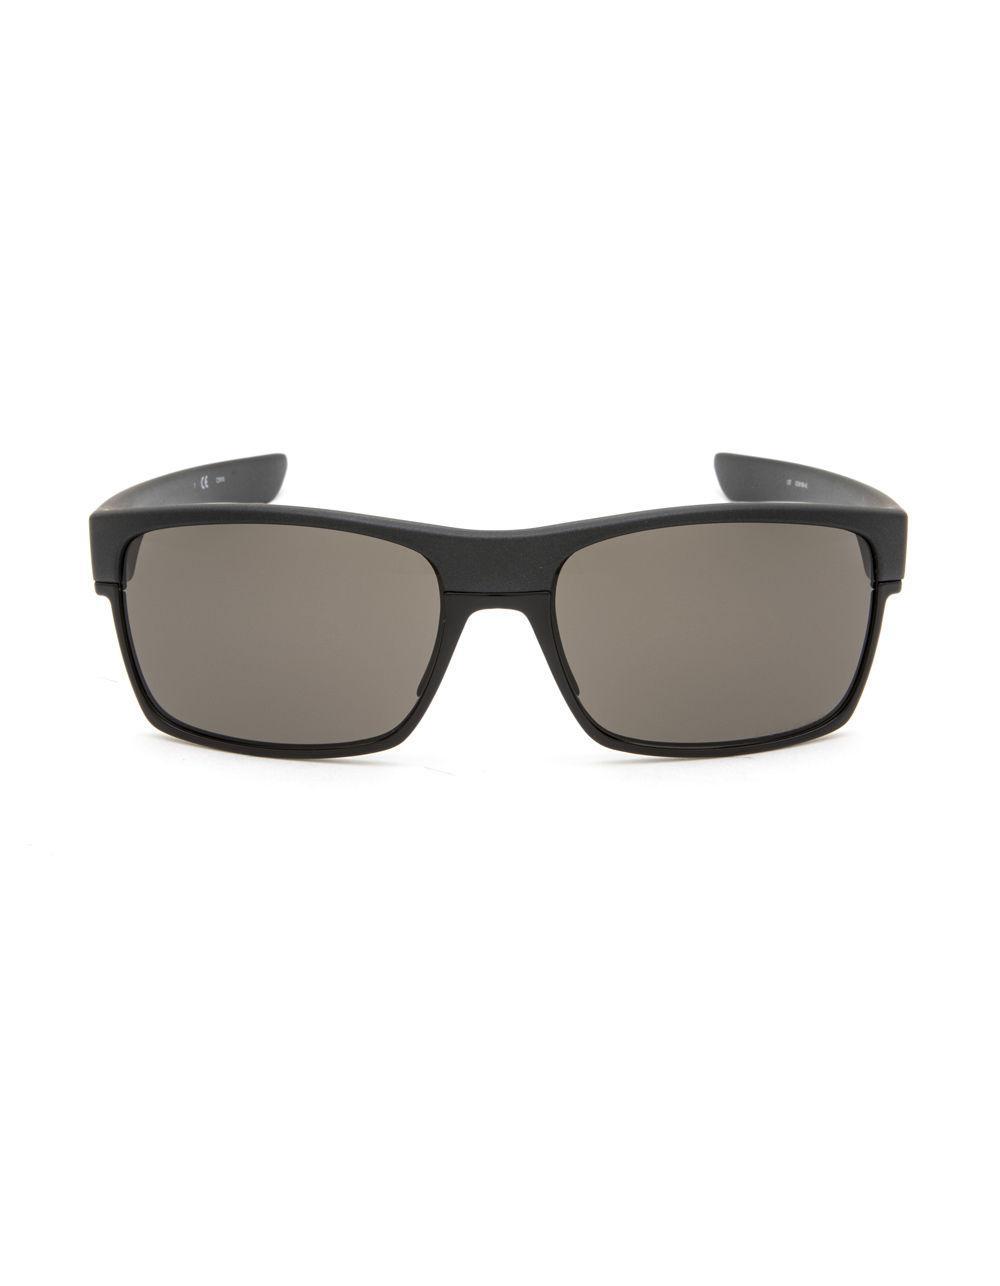 68bcb6735a Lyst - Oakley Twoface Steel   Prizm Gray Sunglasses in Black for Men